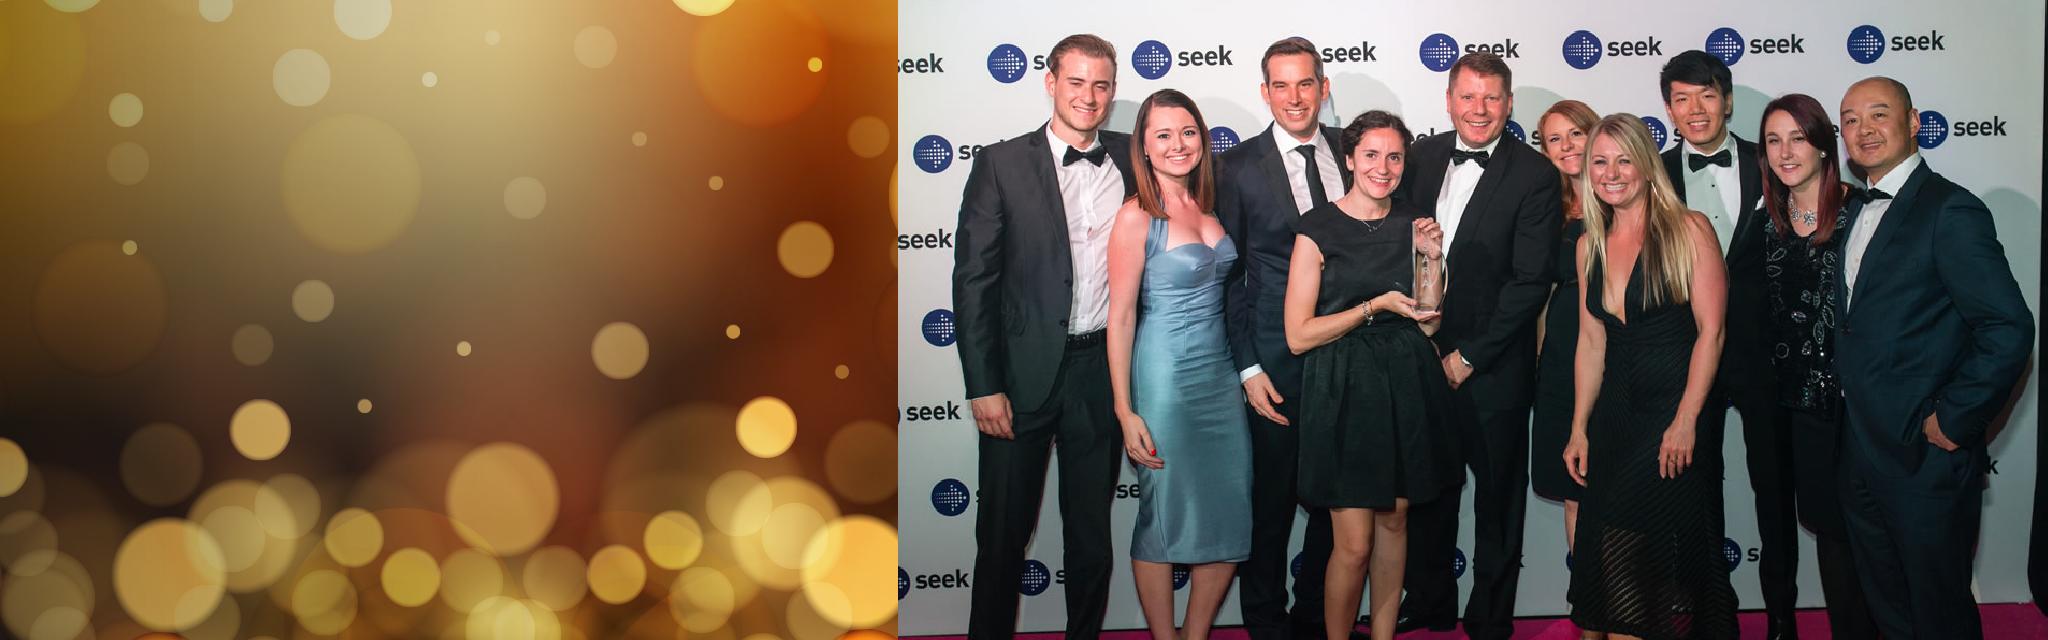 Winner - SEEK Annual Recruitment Awards 2015